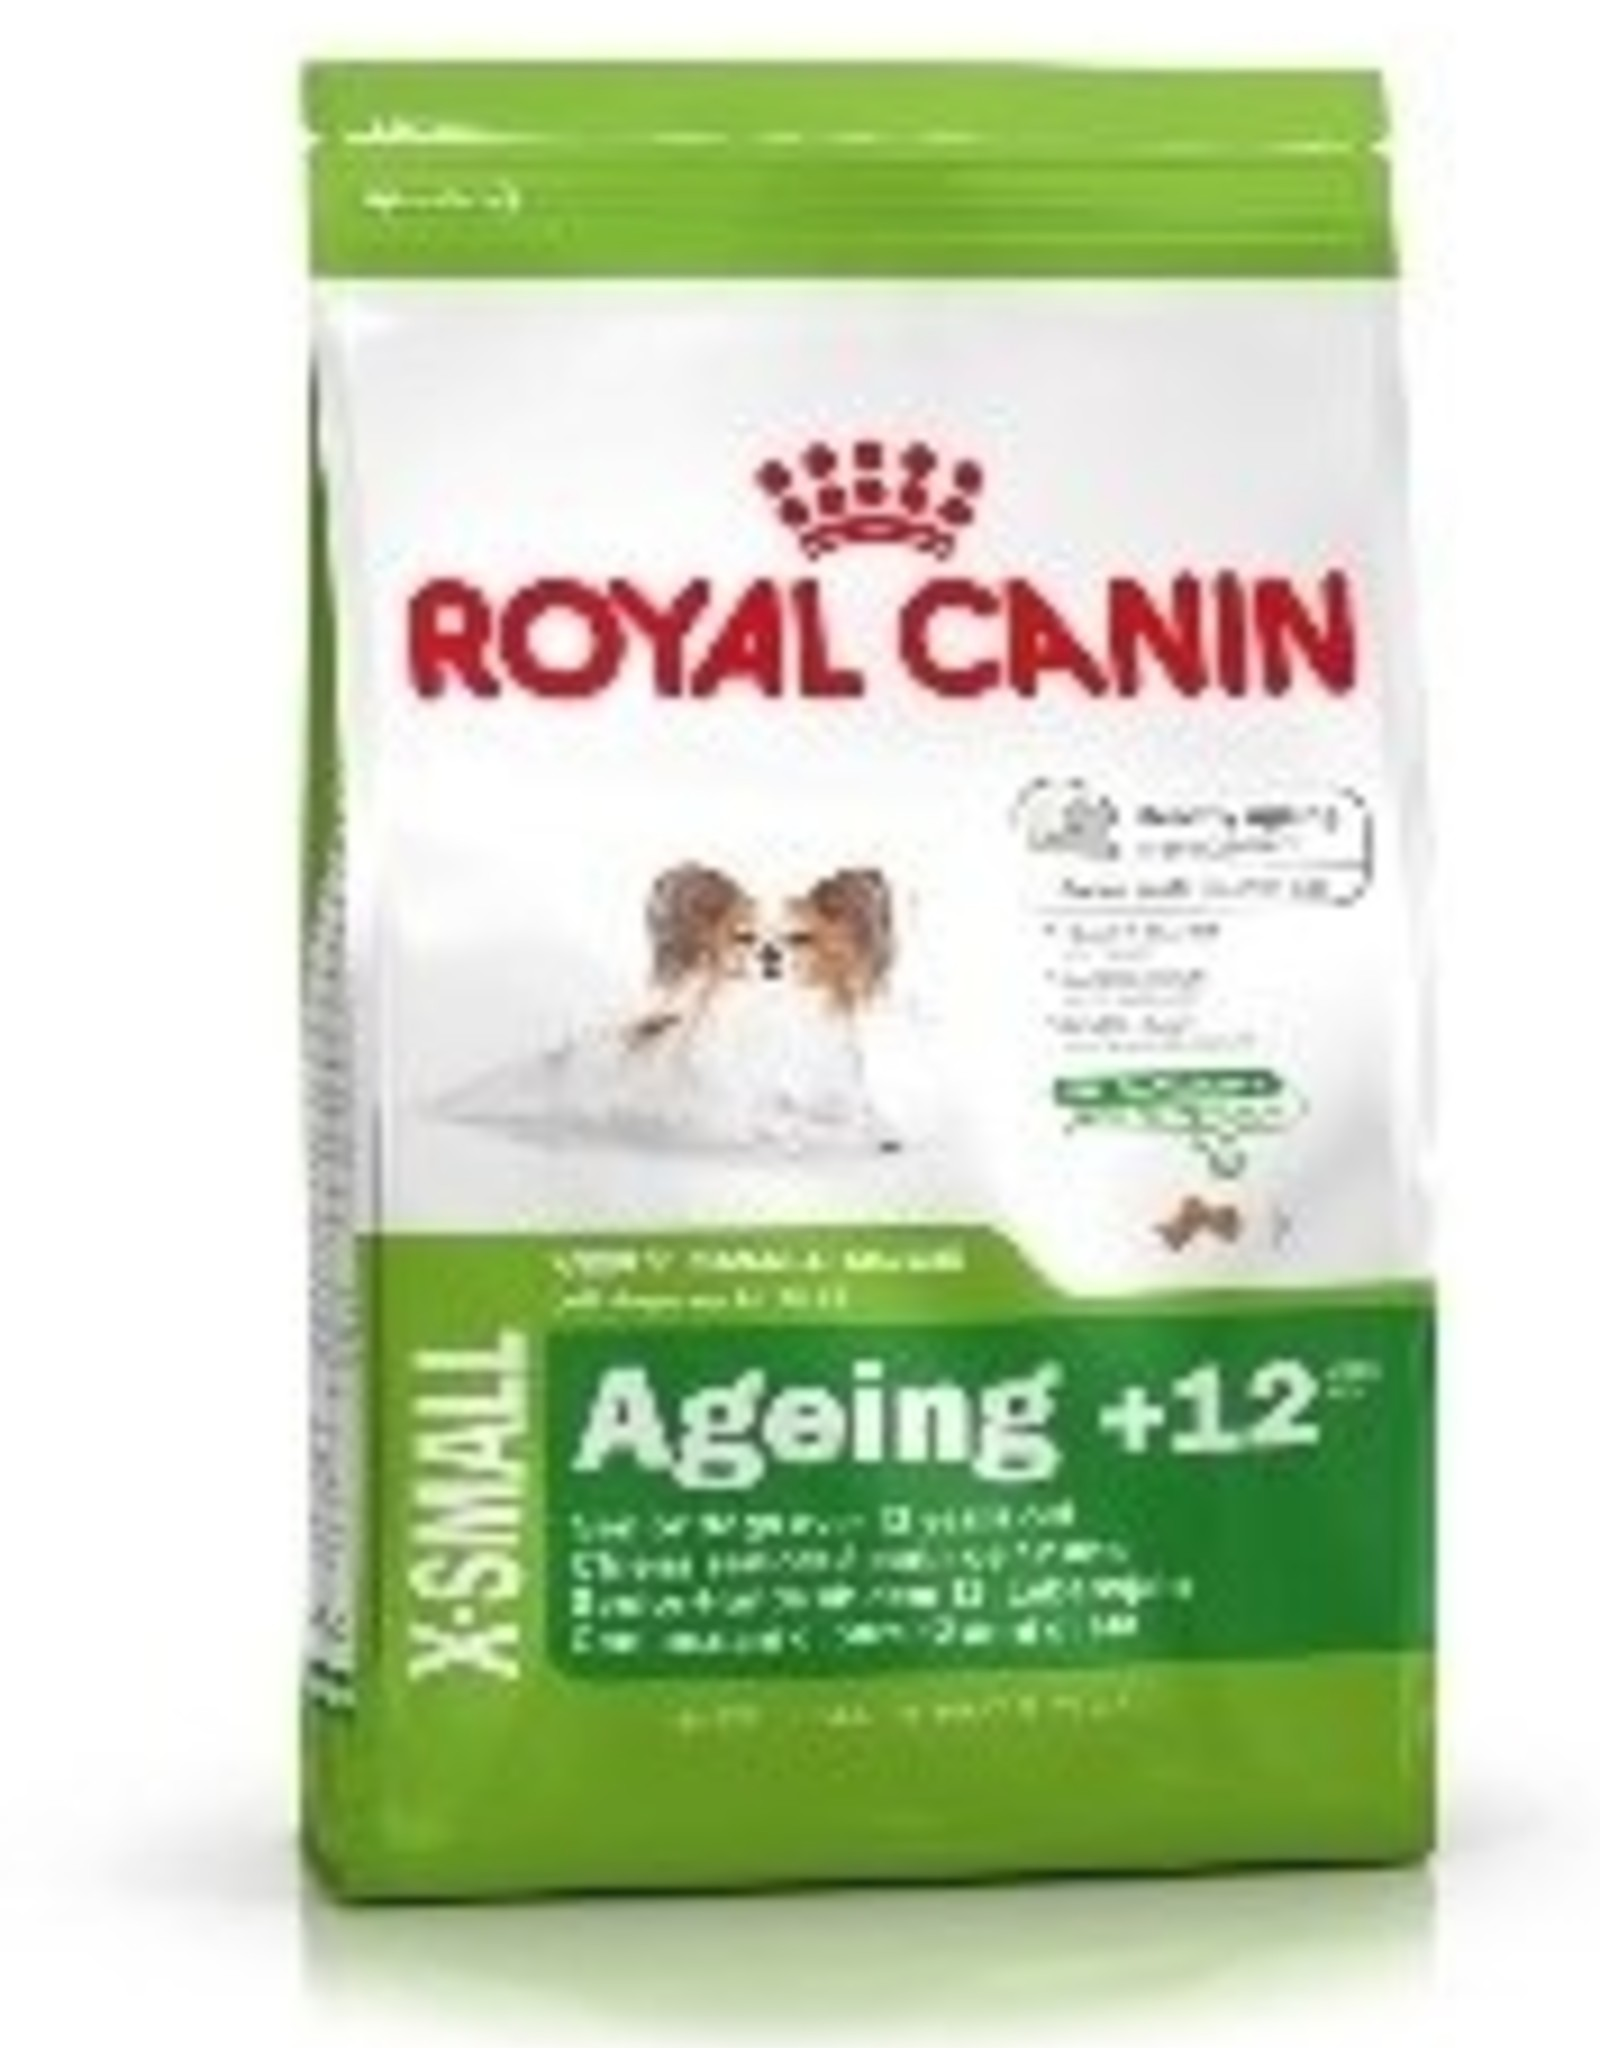 Royal Canin Royal Canin Shn X Small Mature 12+ Hond 1,5kg